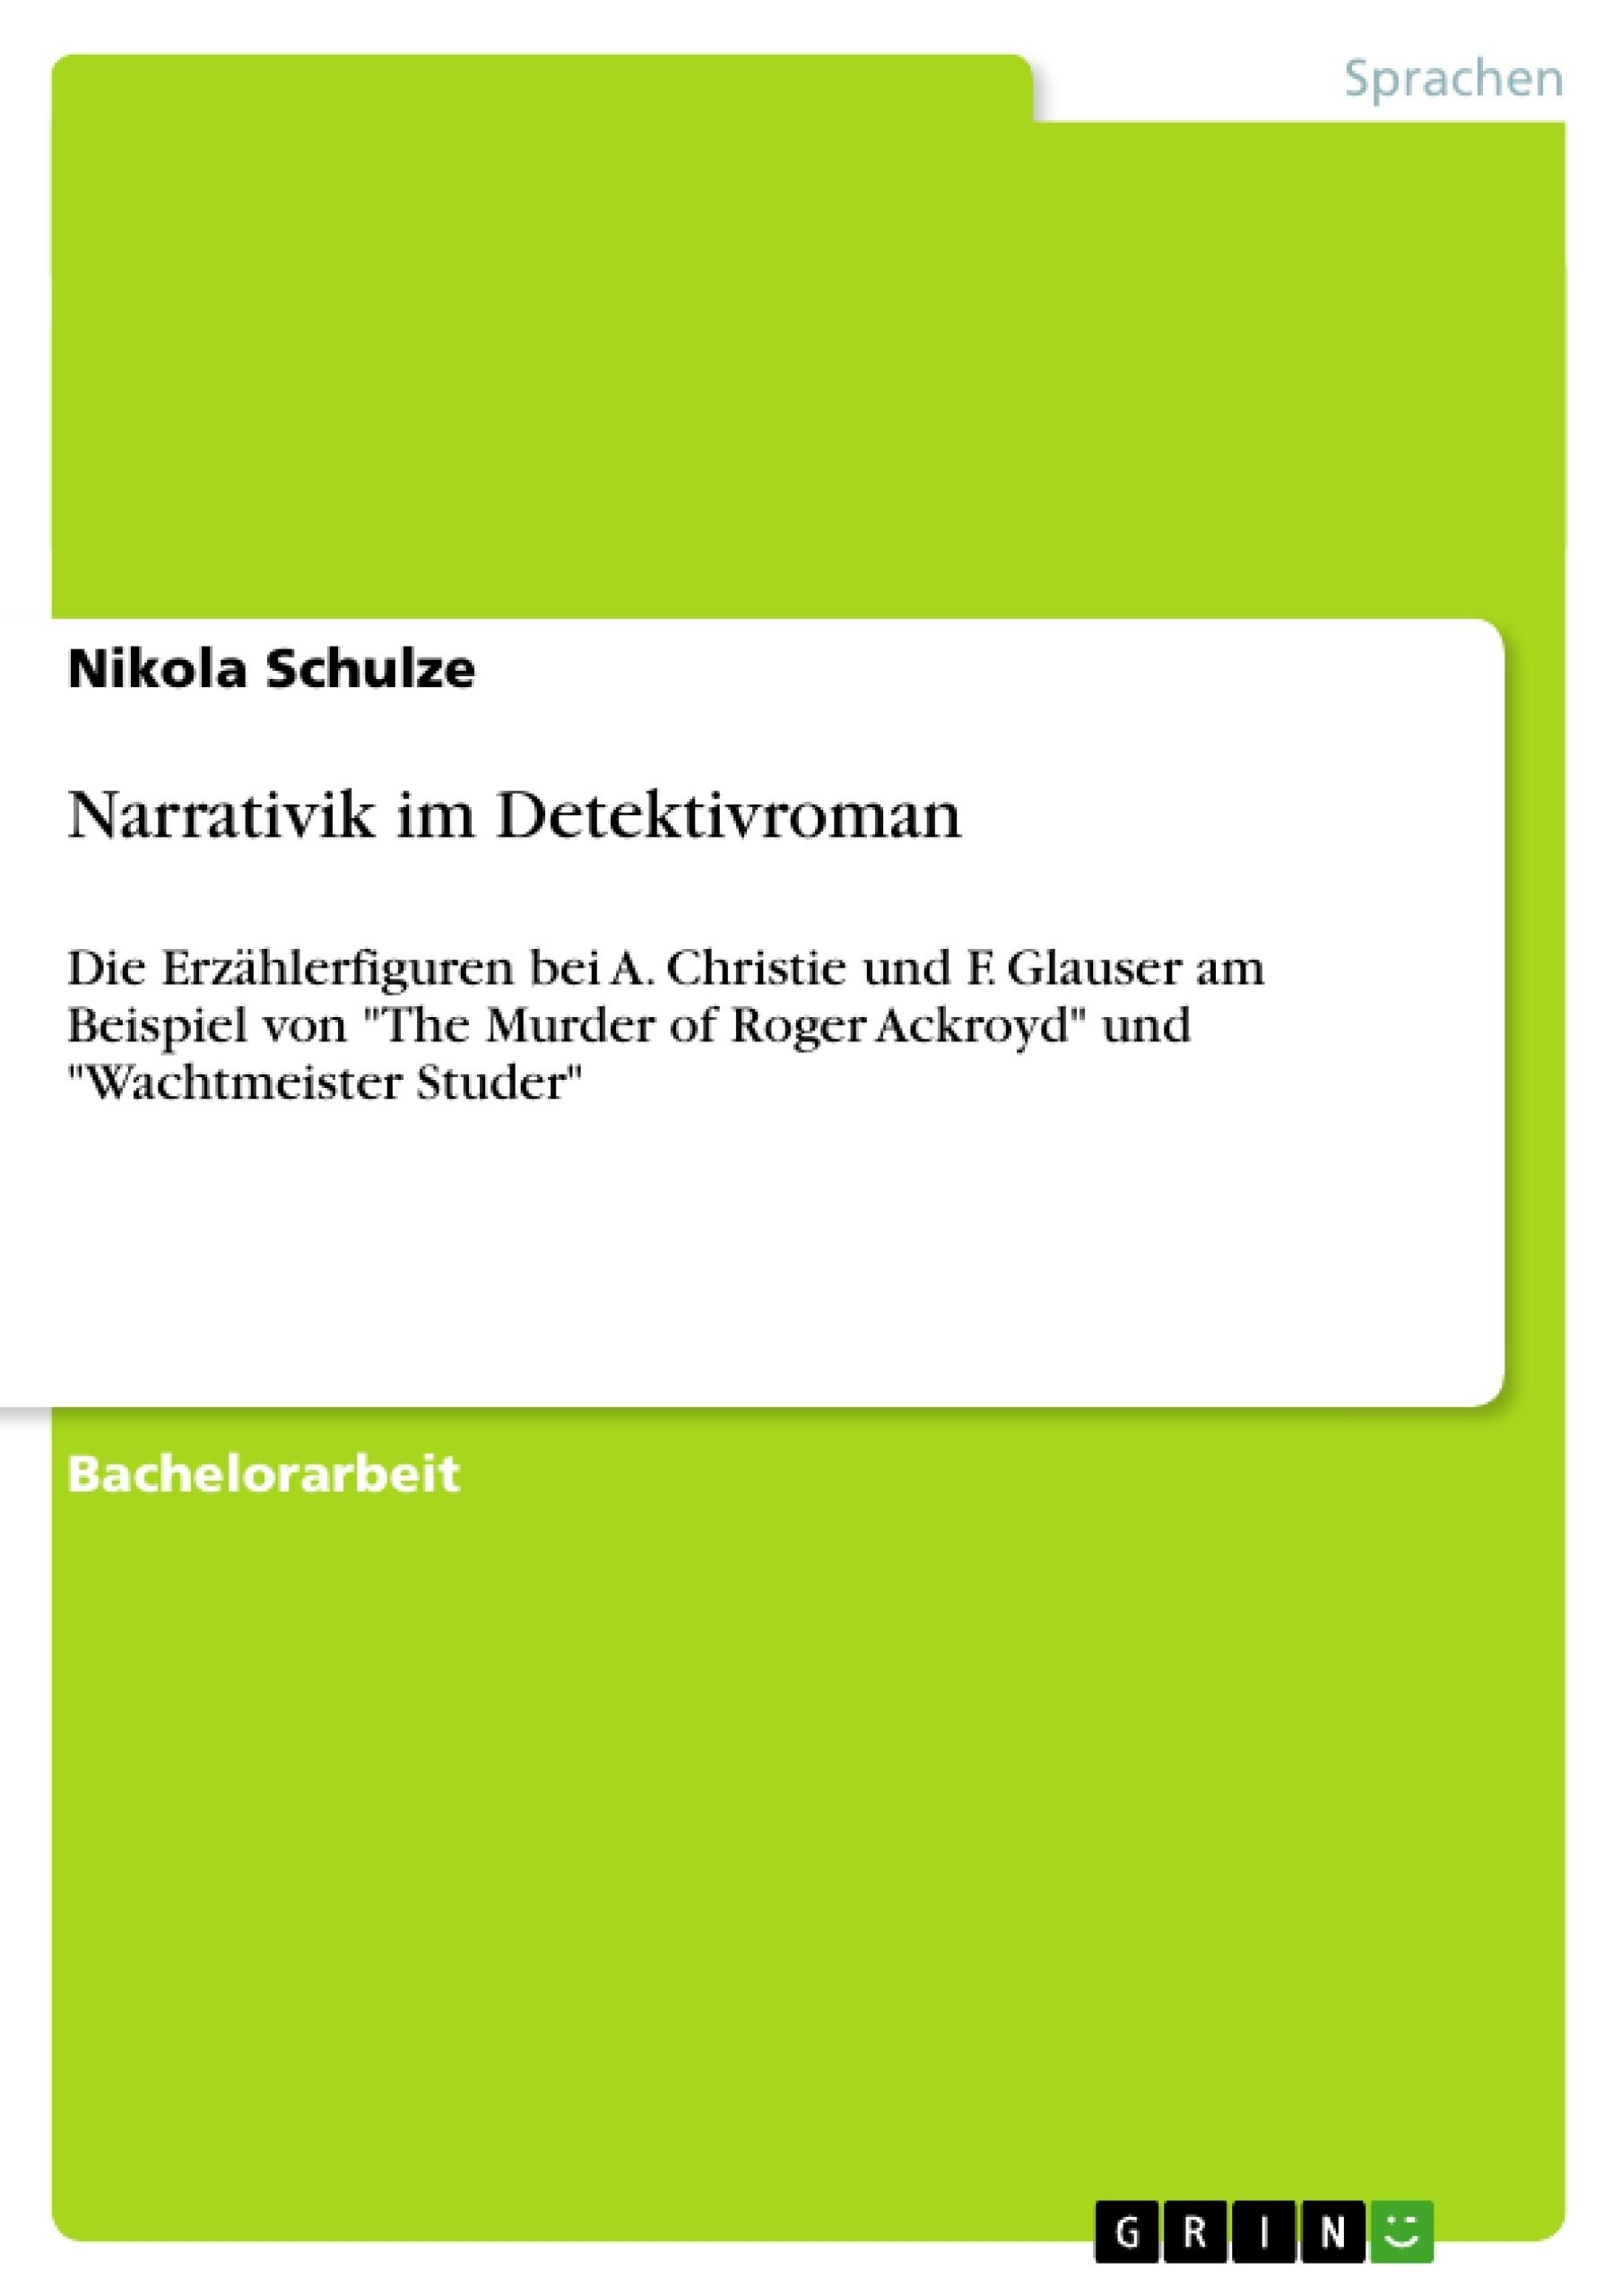 Titel: Narrativik im Detektivroman